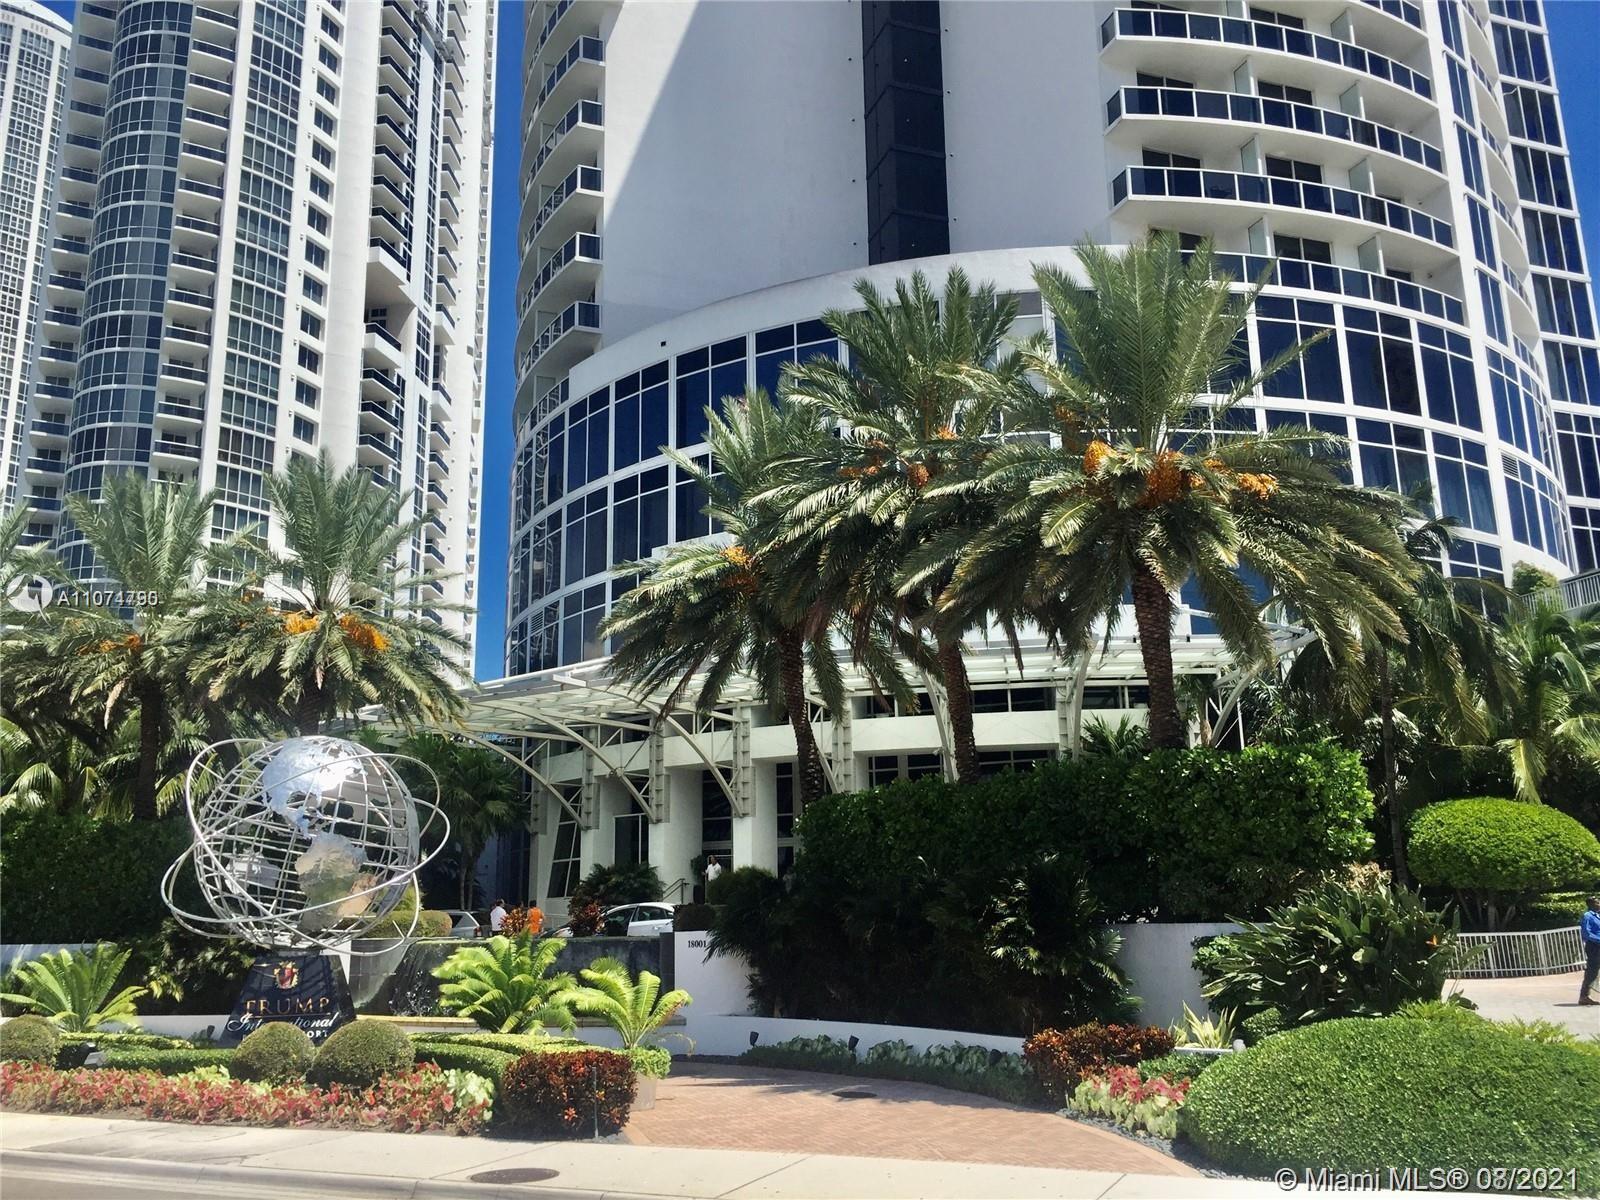 Trump International #912 - 18001 Collins Ave #912, Sunny Isles Beach, FL 33160